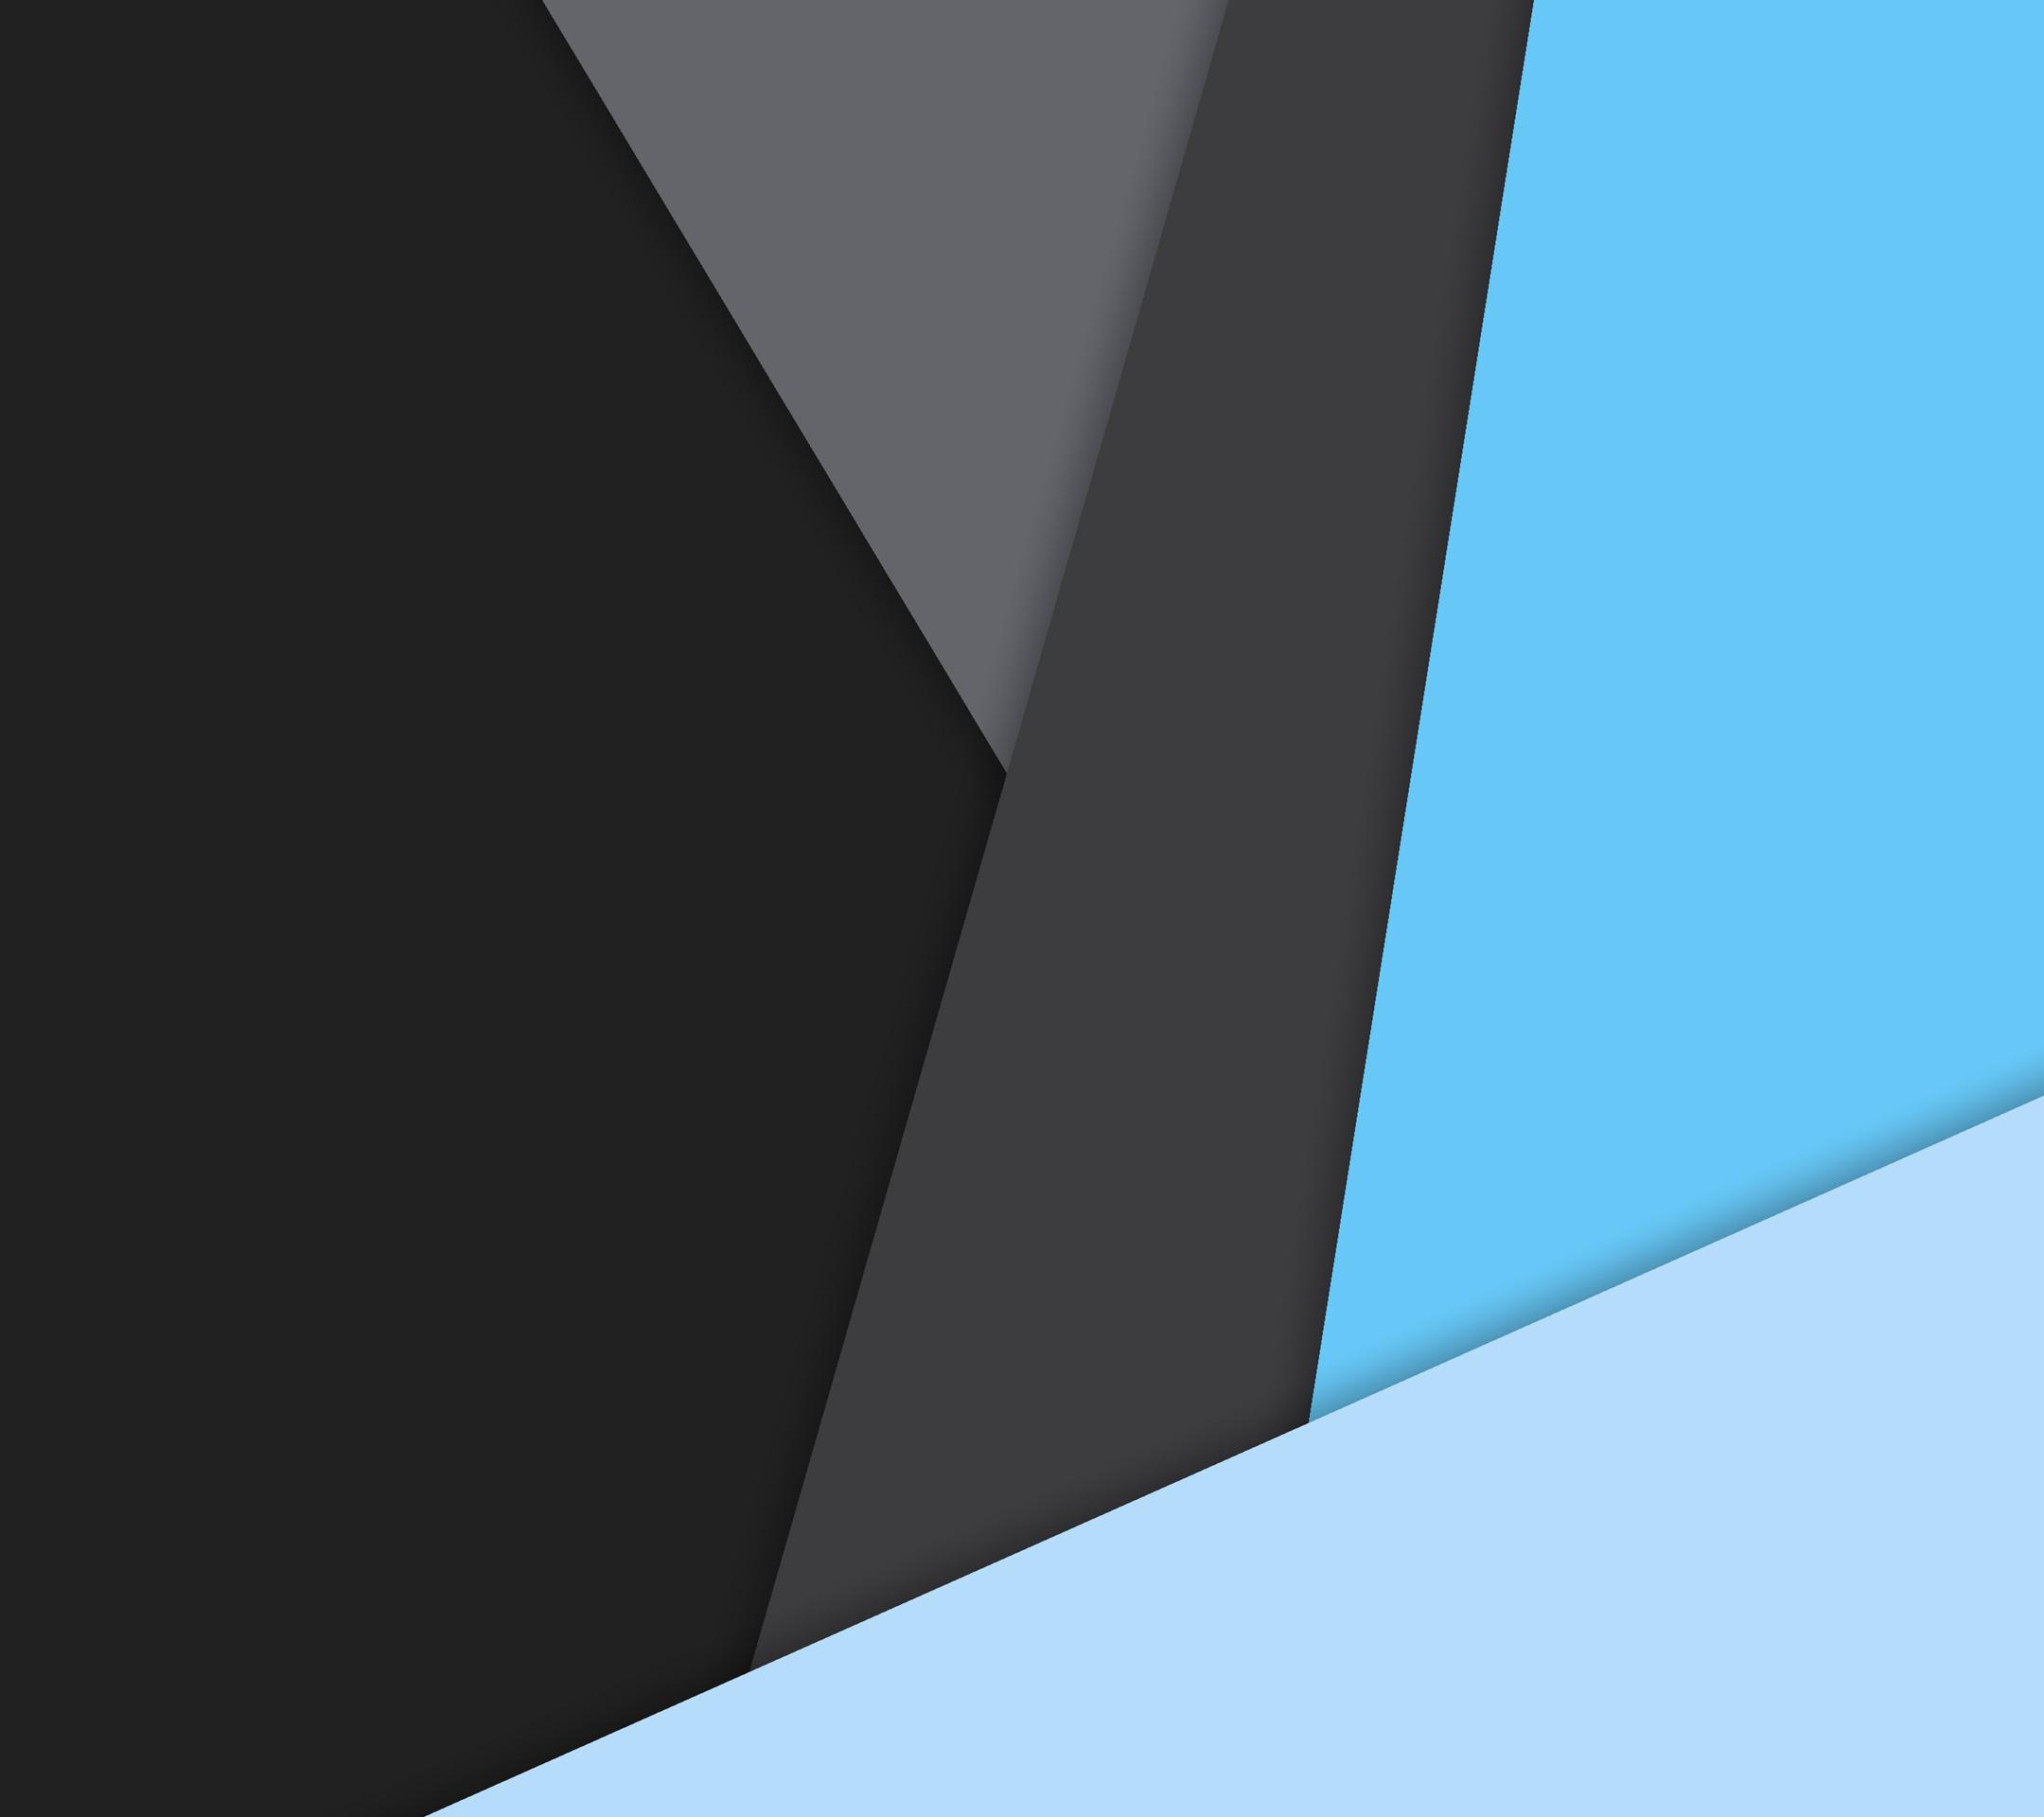 Hd wallpaper xda - Material Design Wallpapers Xda Wallppaper Zones Collection 2015